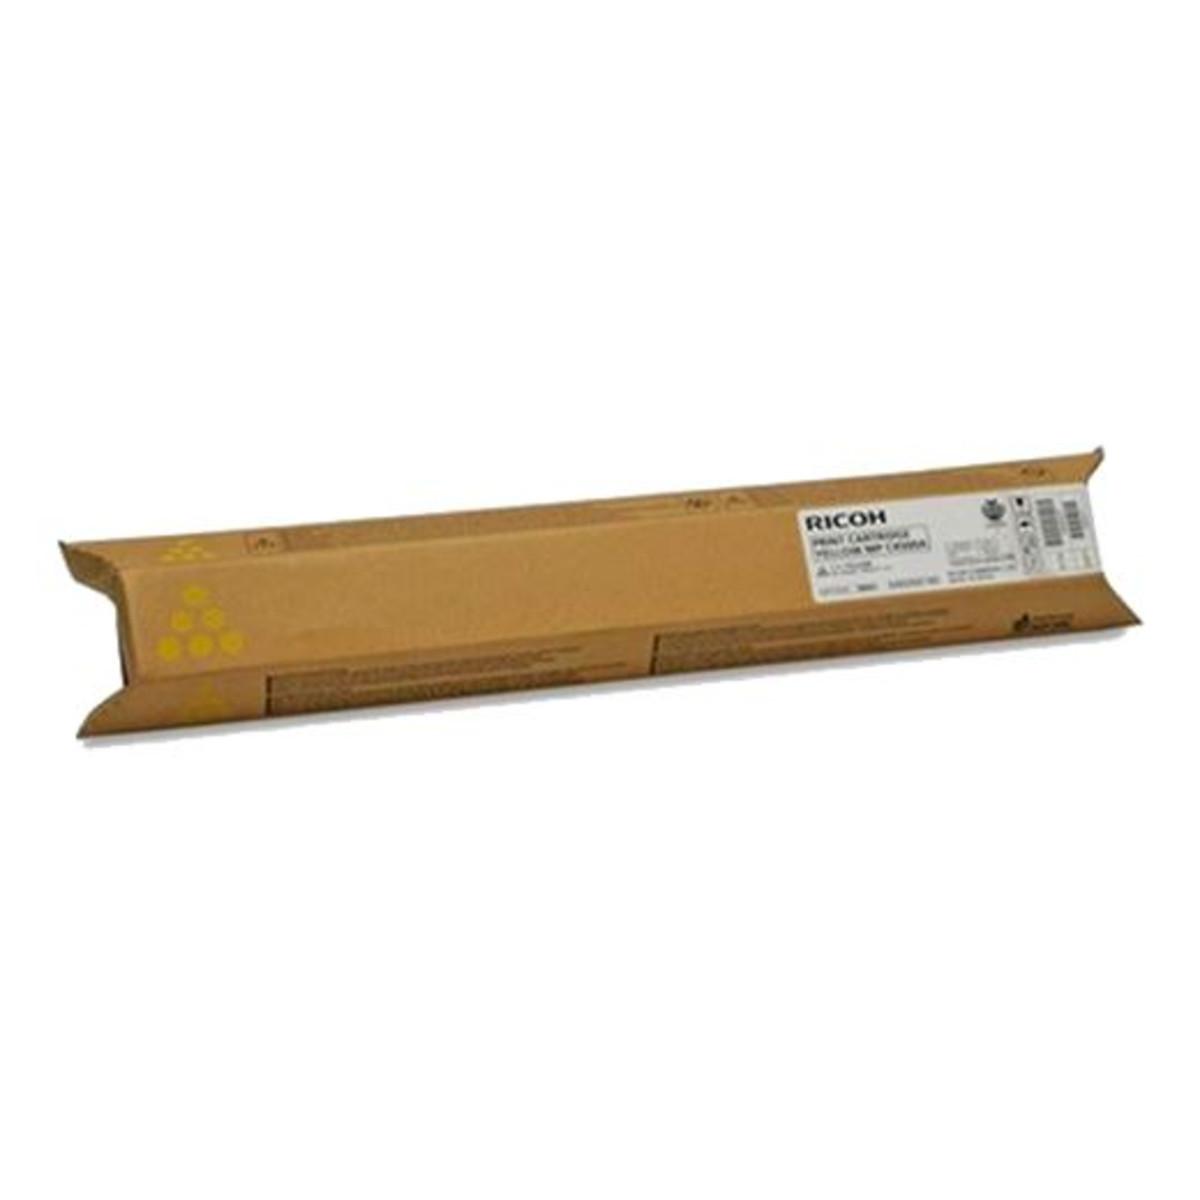 Ricoh (841523) Yellow Toner Cartridge